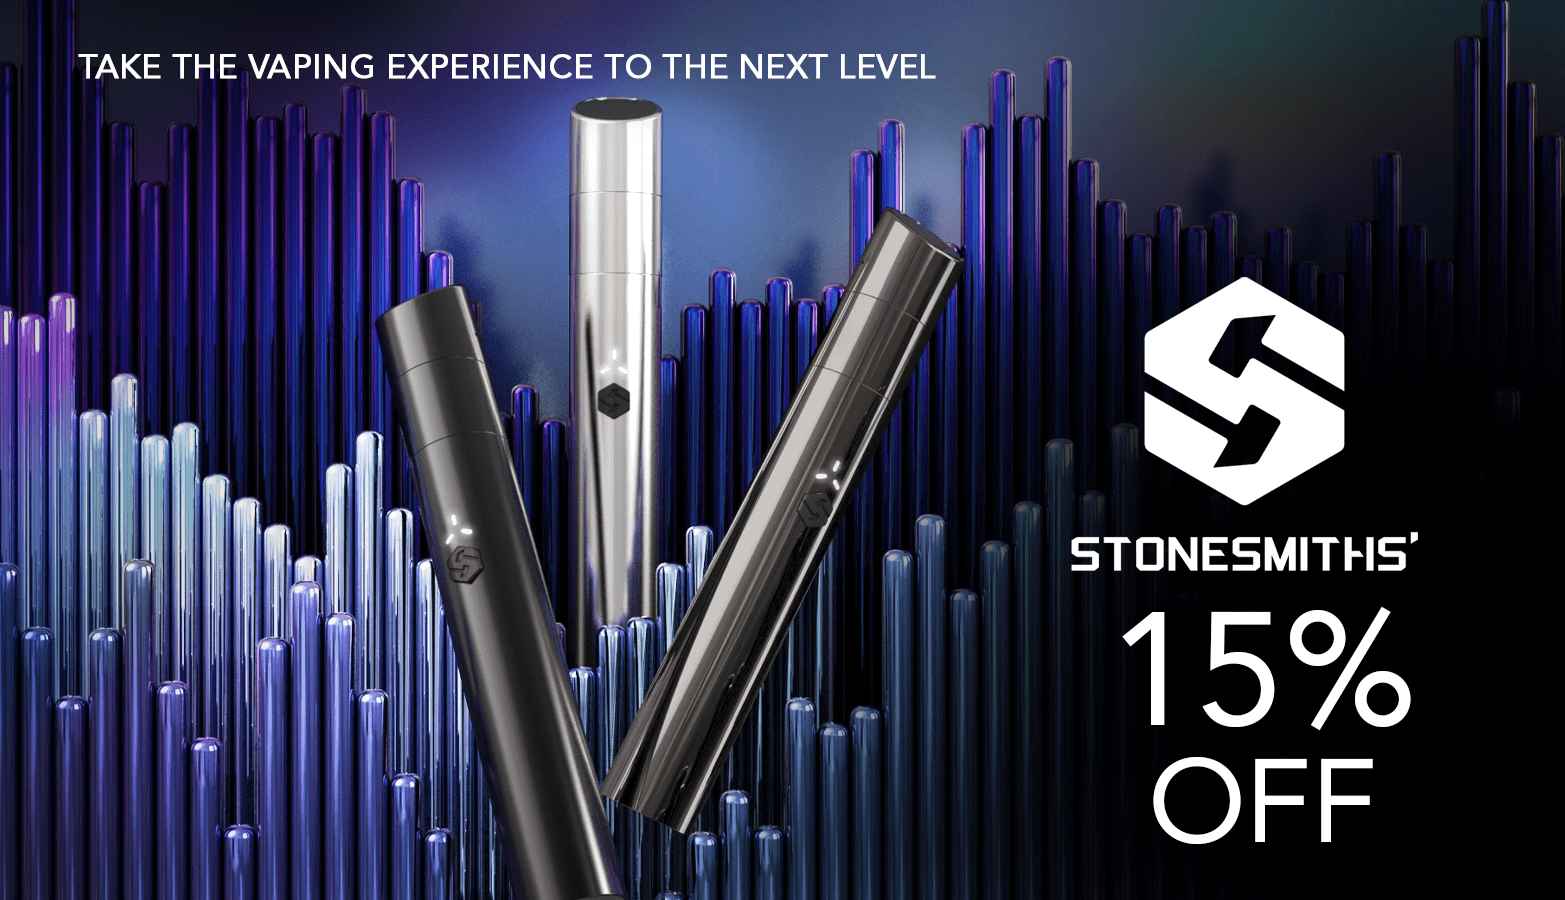 StoneSmiths Coupon Code Website